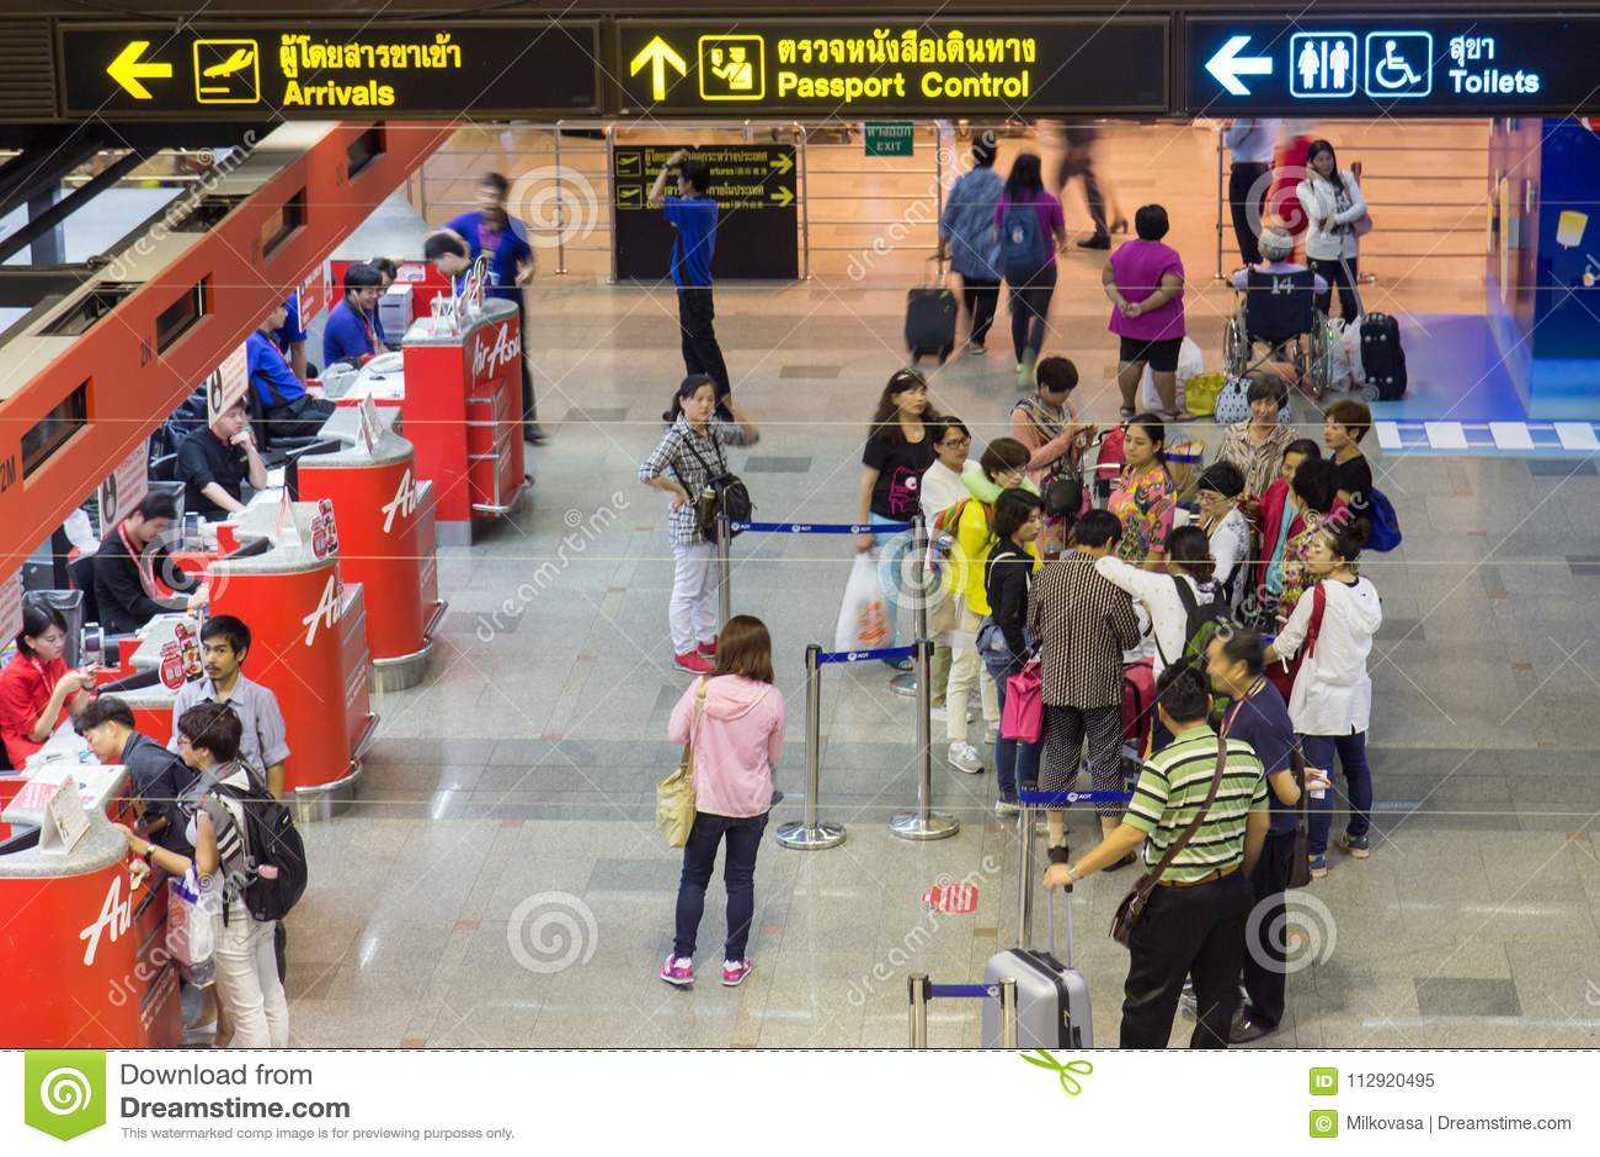 Traffic at the airport Don Muang